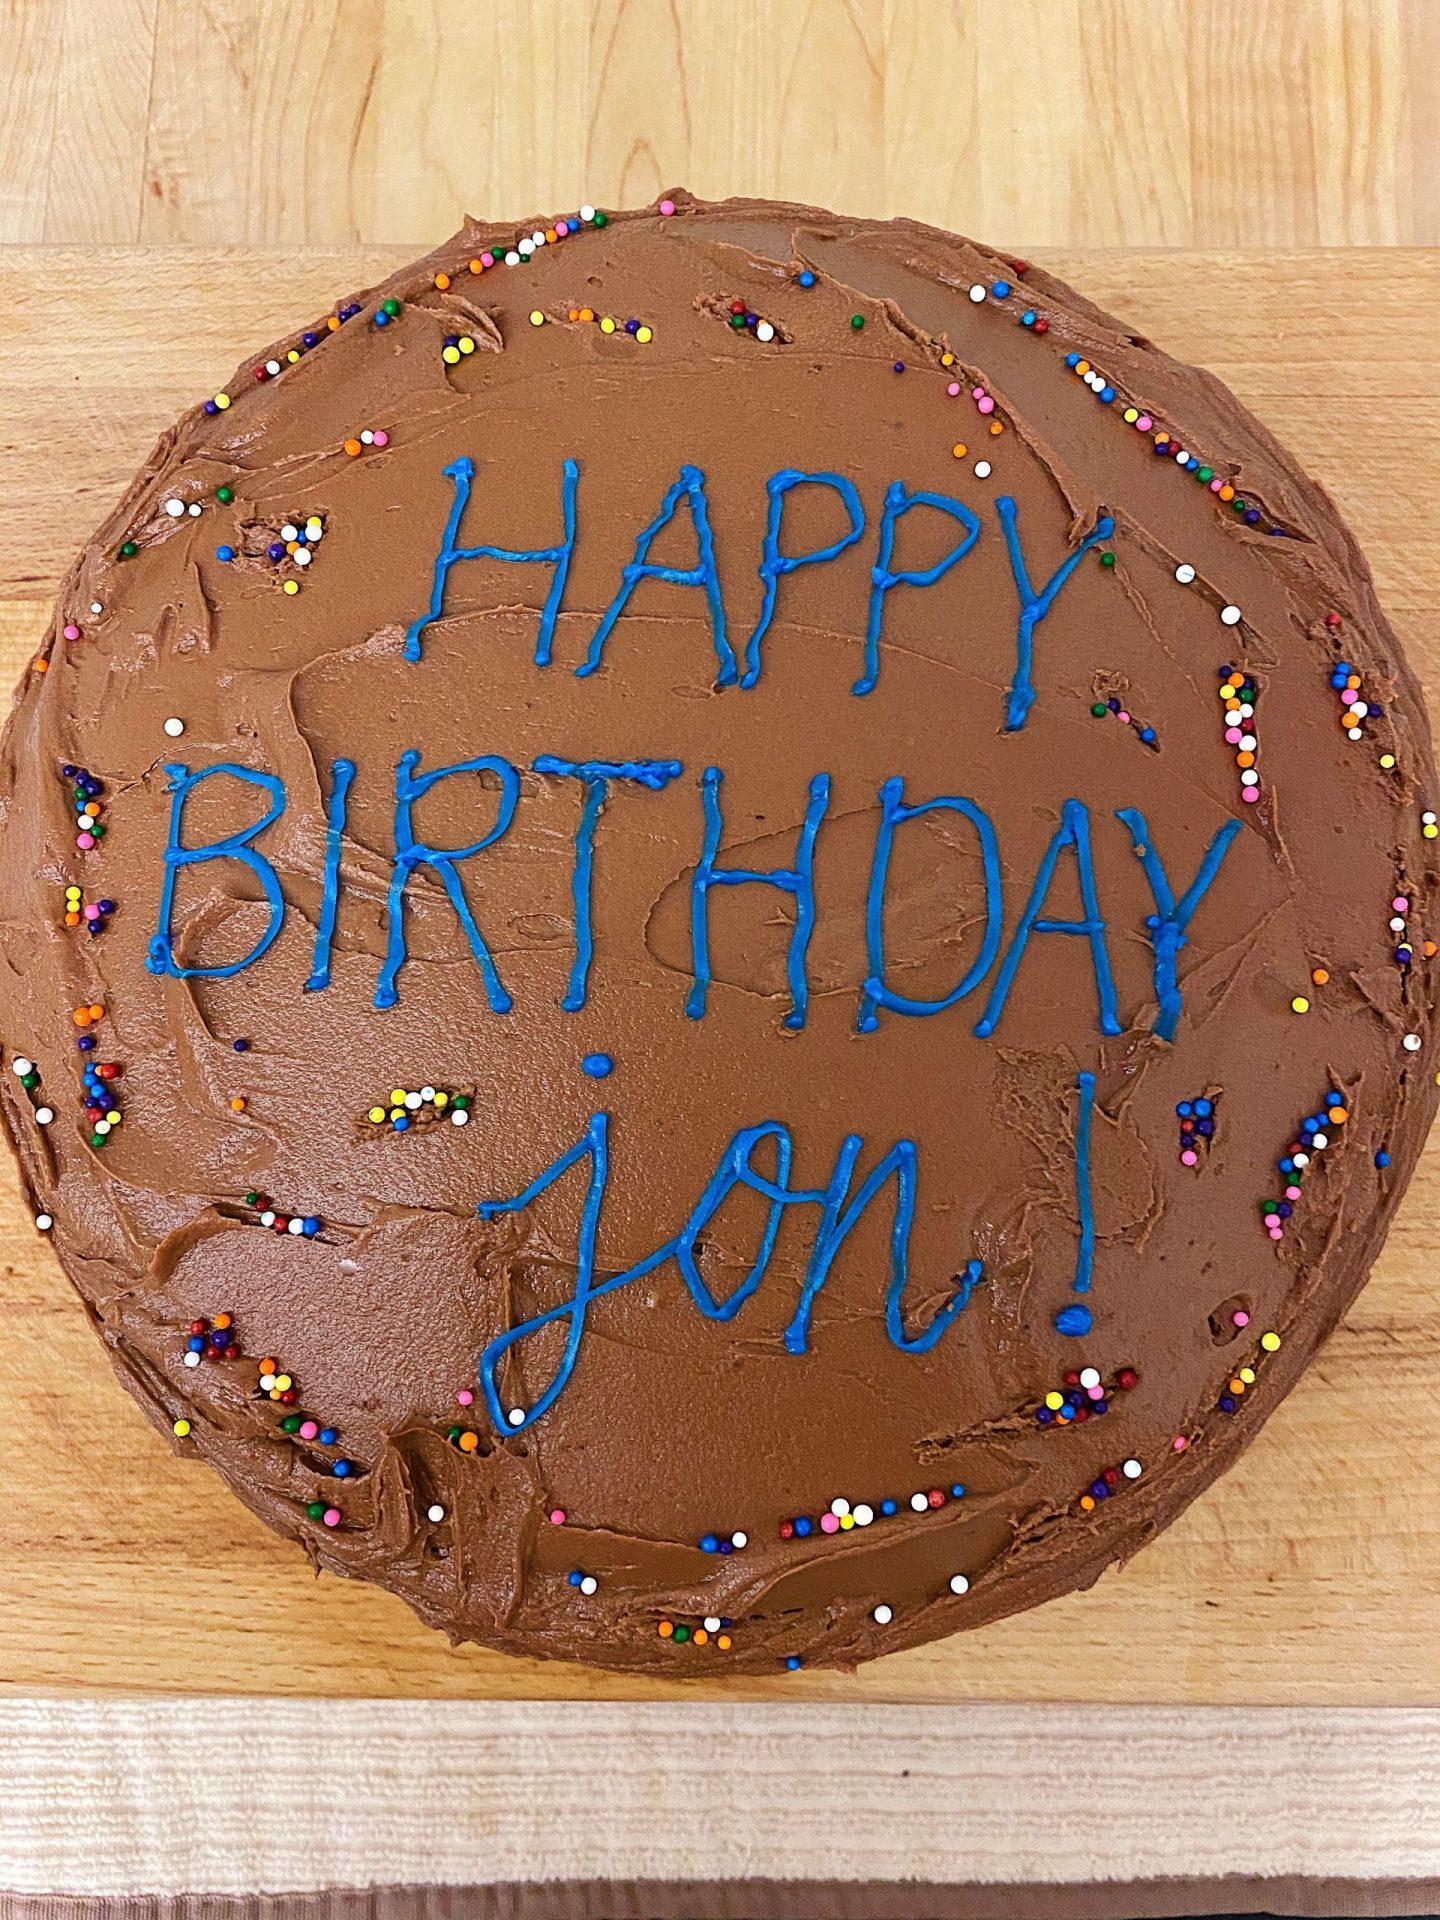 My first chocolate cake